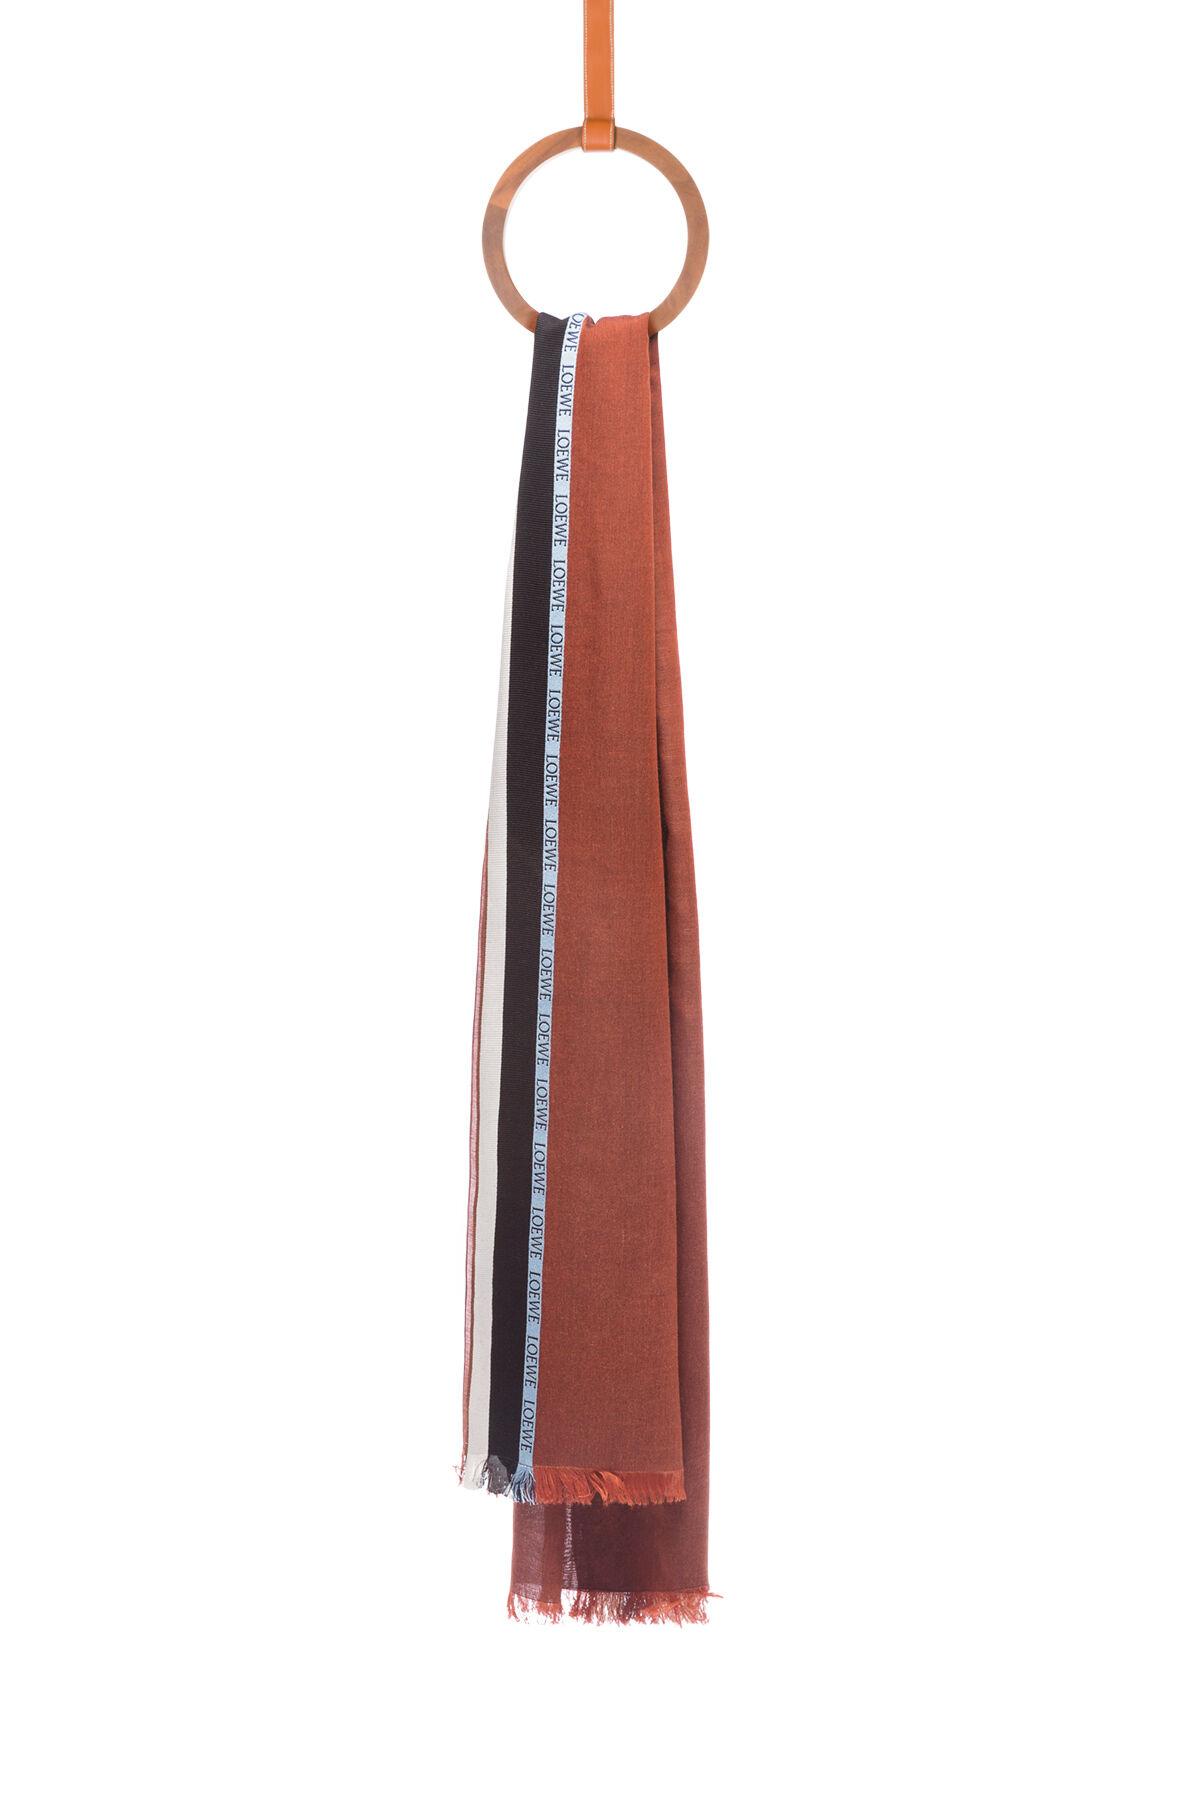 LOEWE 70X200 スカーフ ロエベ ボーダー チョコレート all